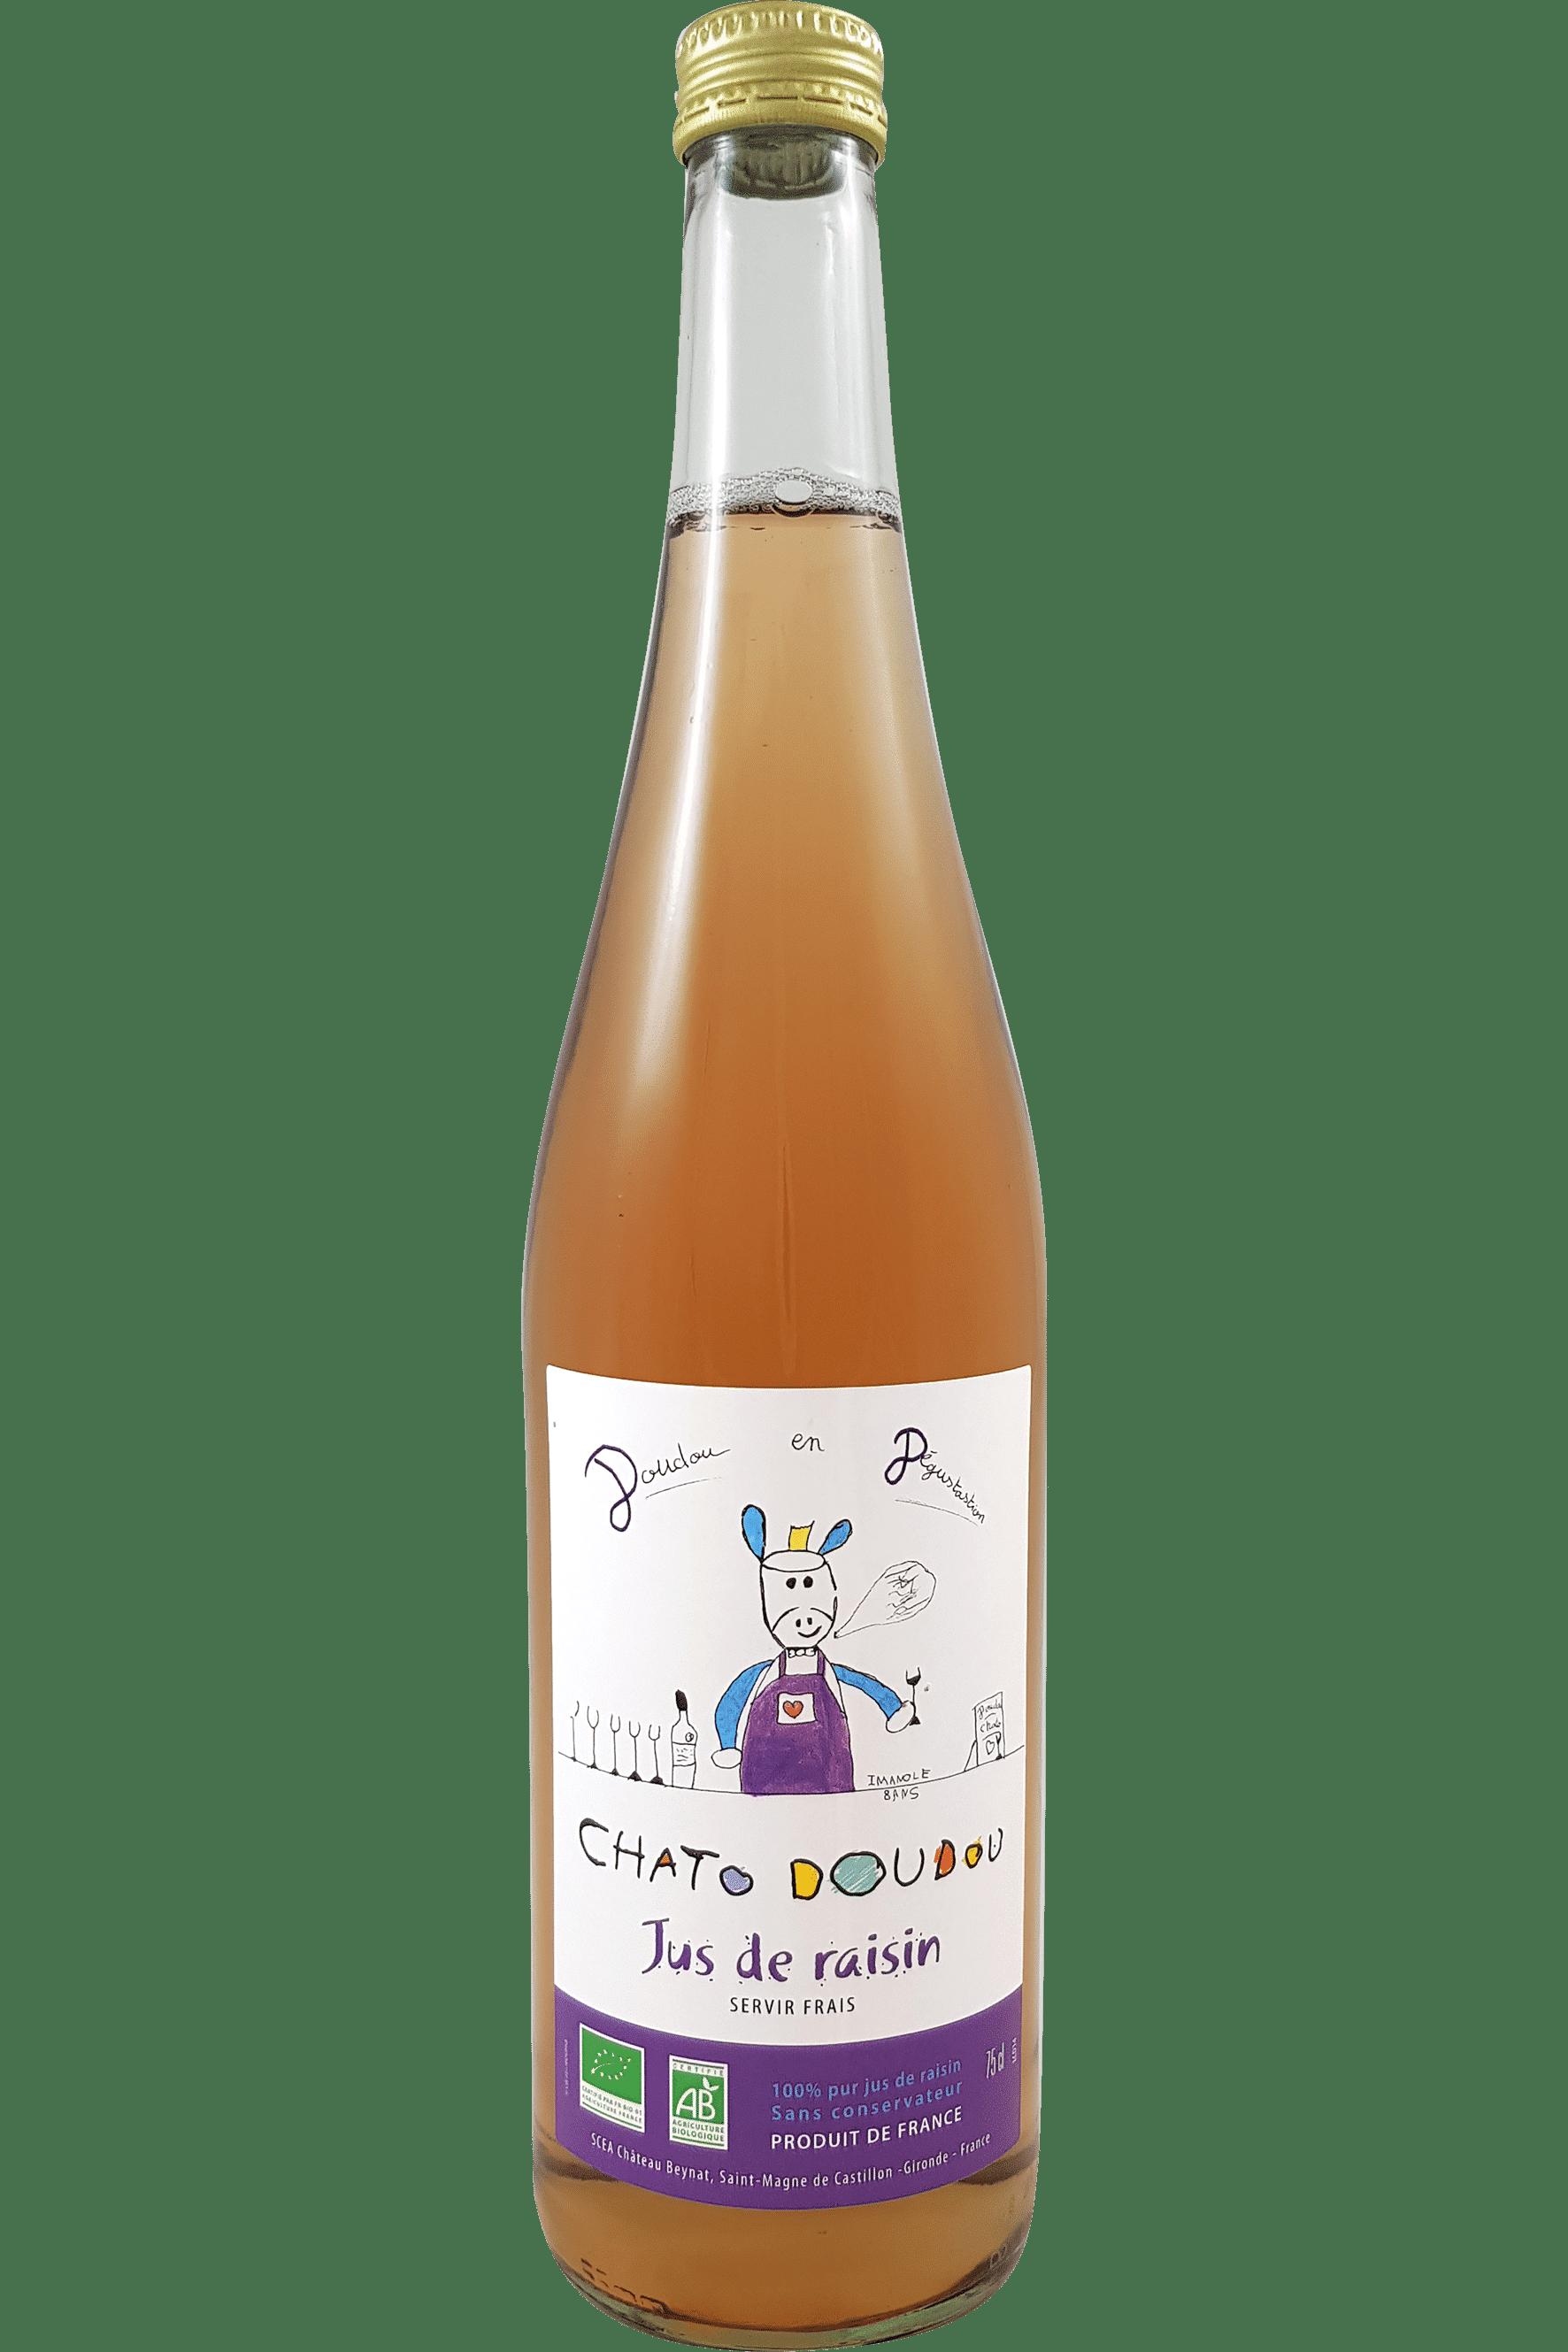 Chato doudou - Jus de raisin bio - Château Beynat